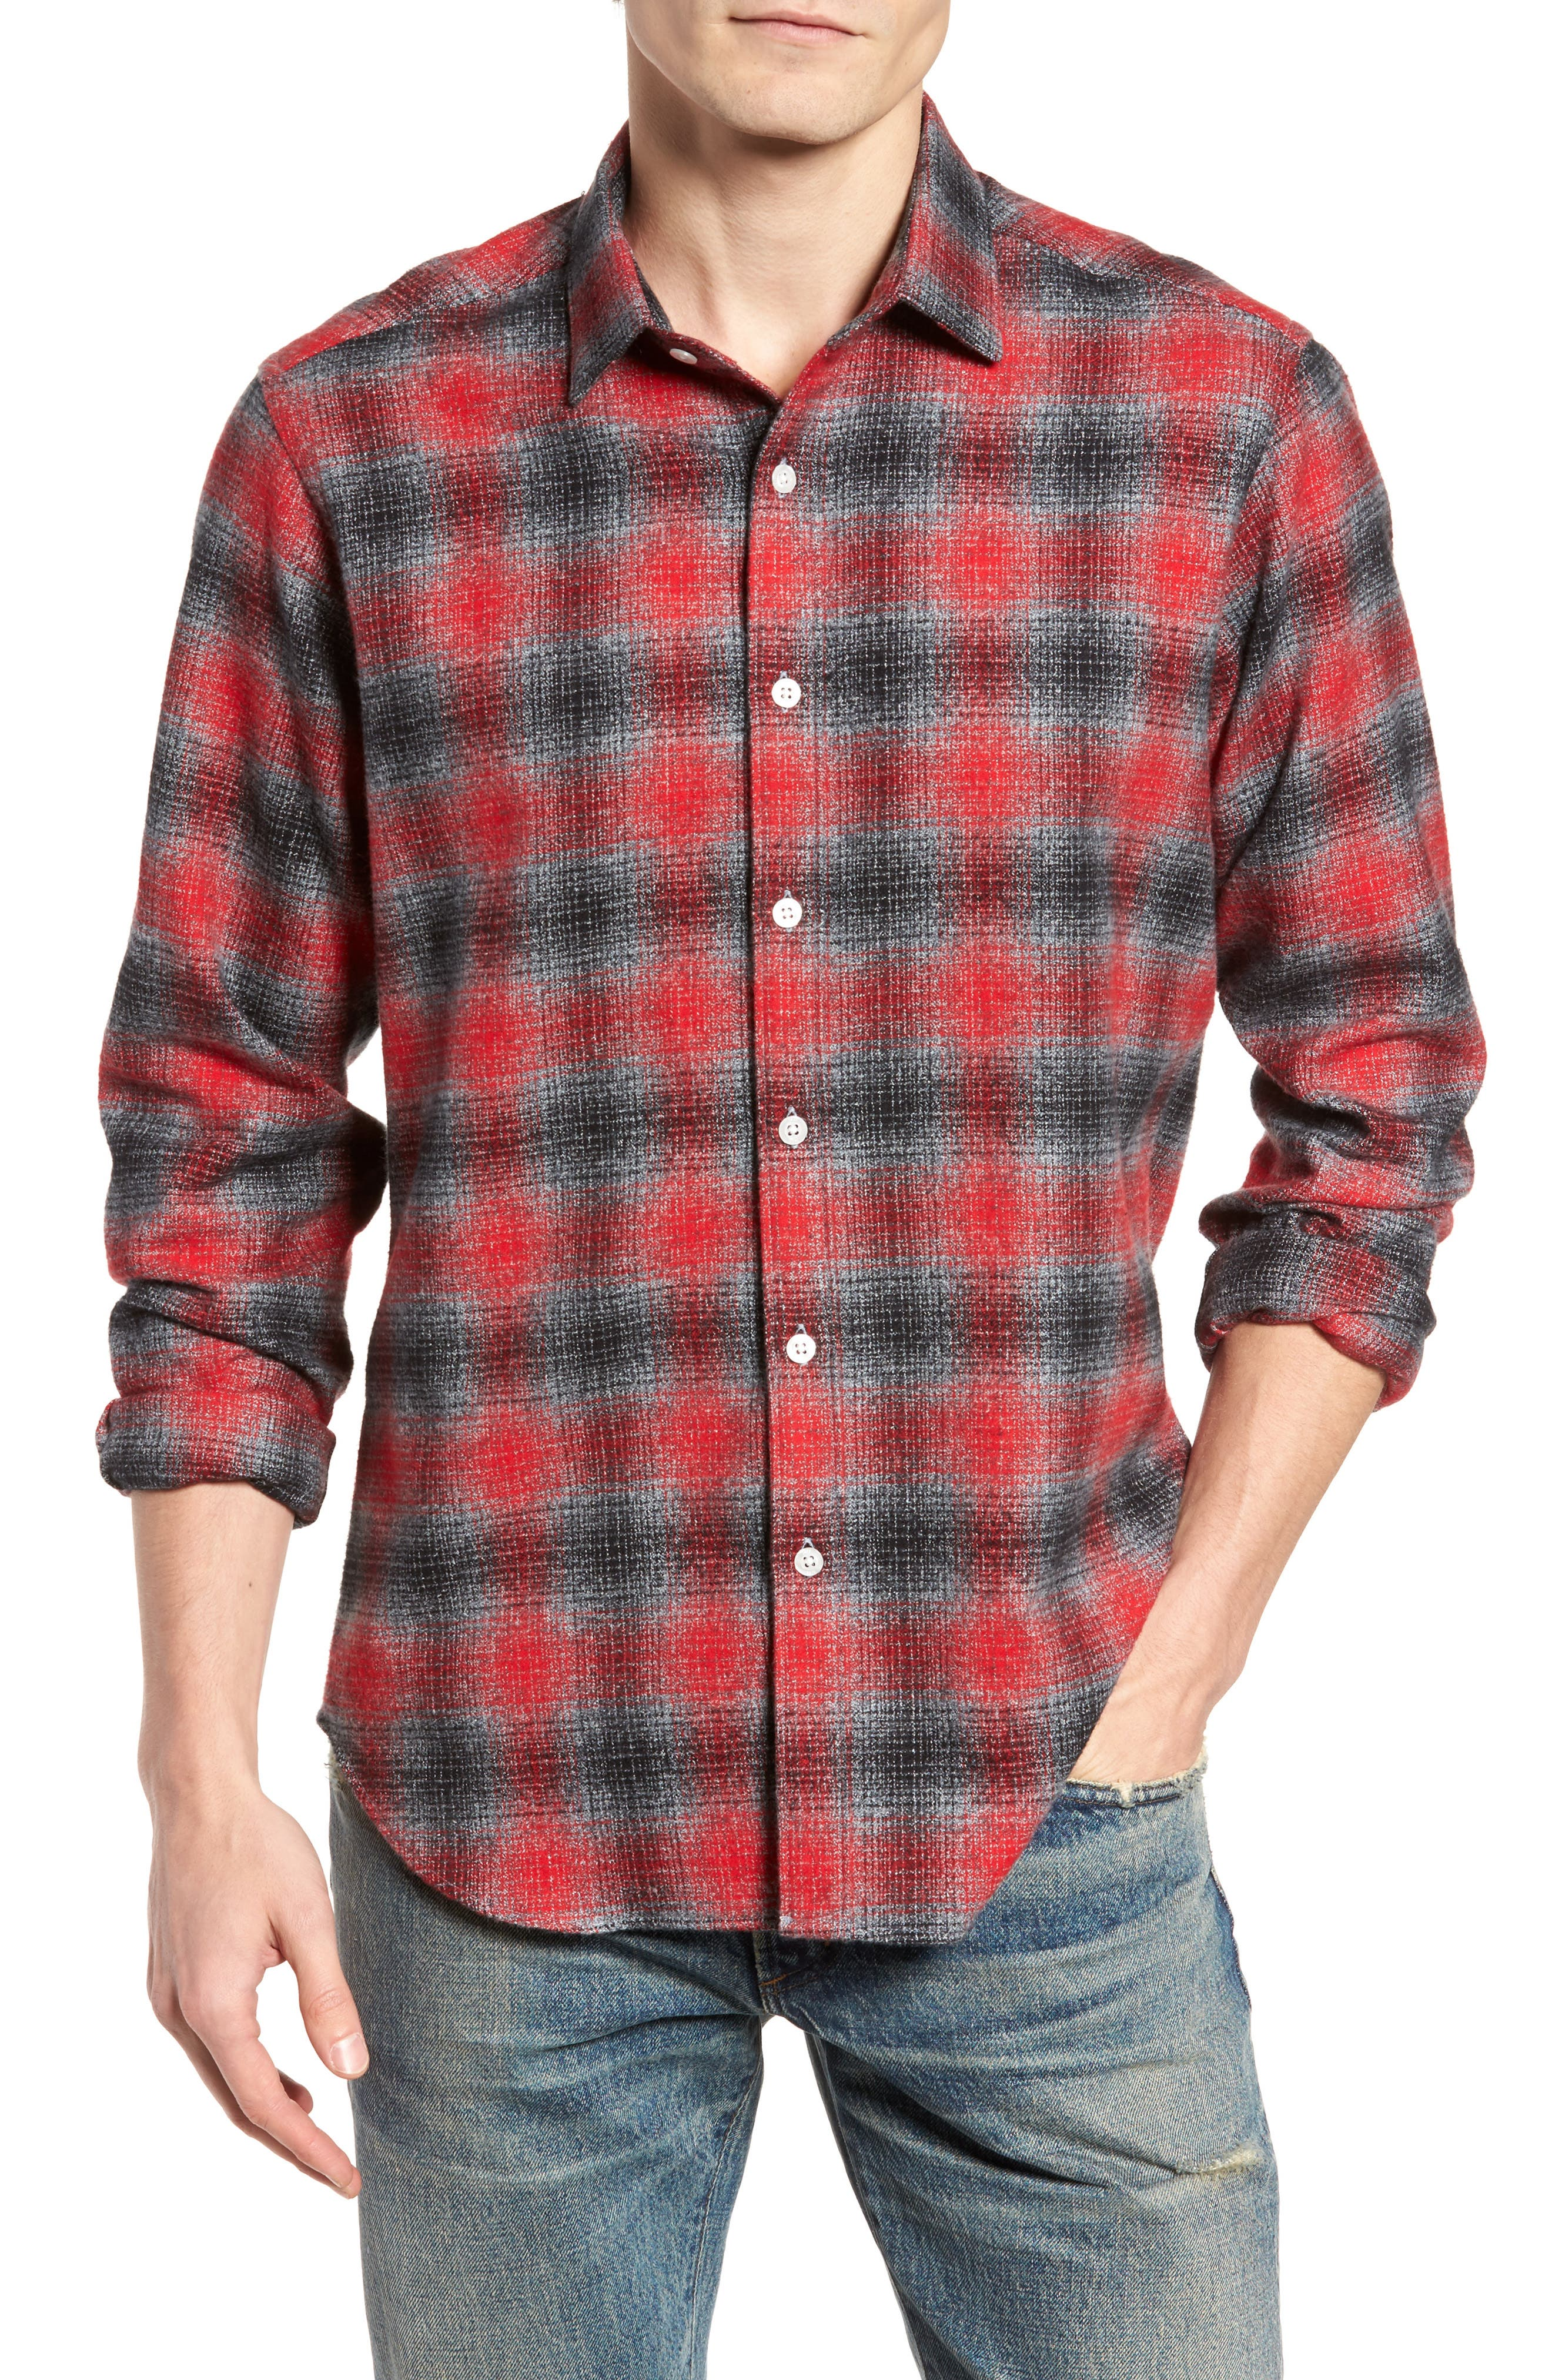 Stowe Slim Fit Plaid Sport Shirt,                             Main thumbnail 1, color,                             021